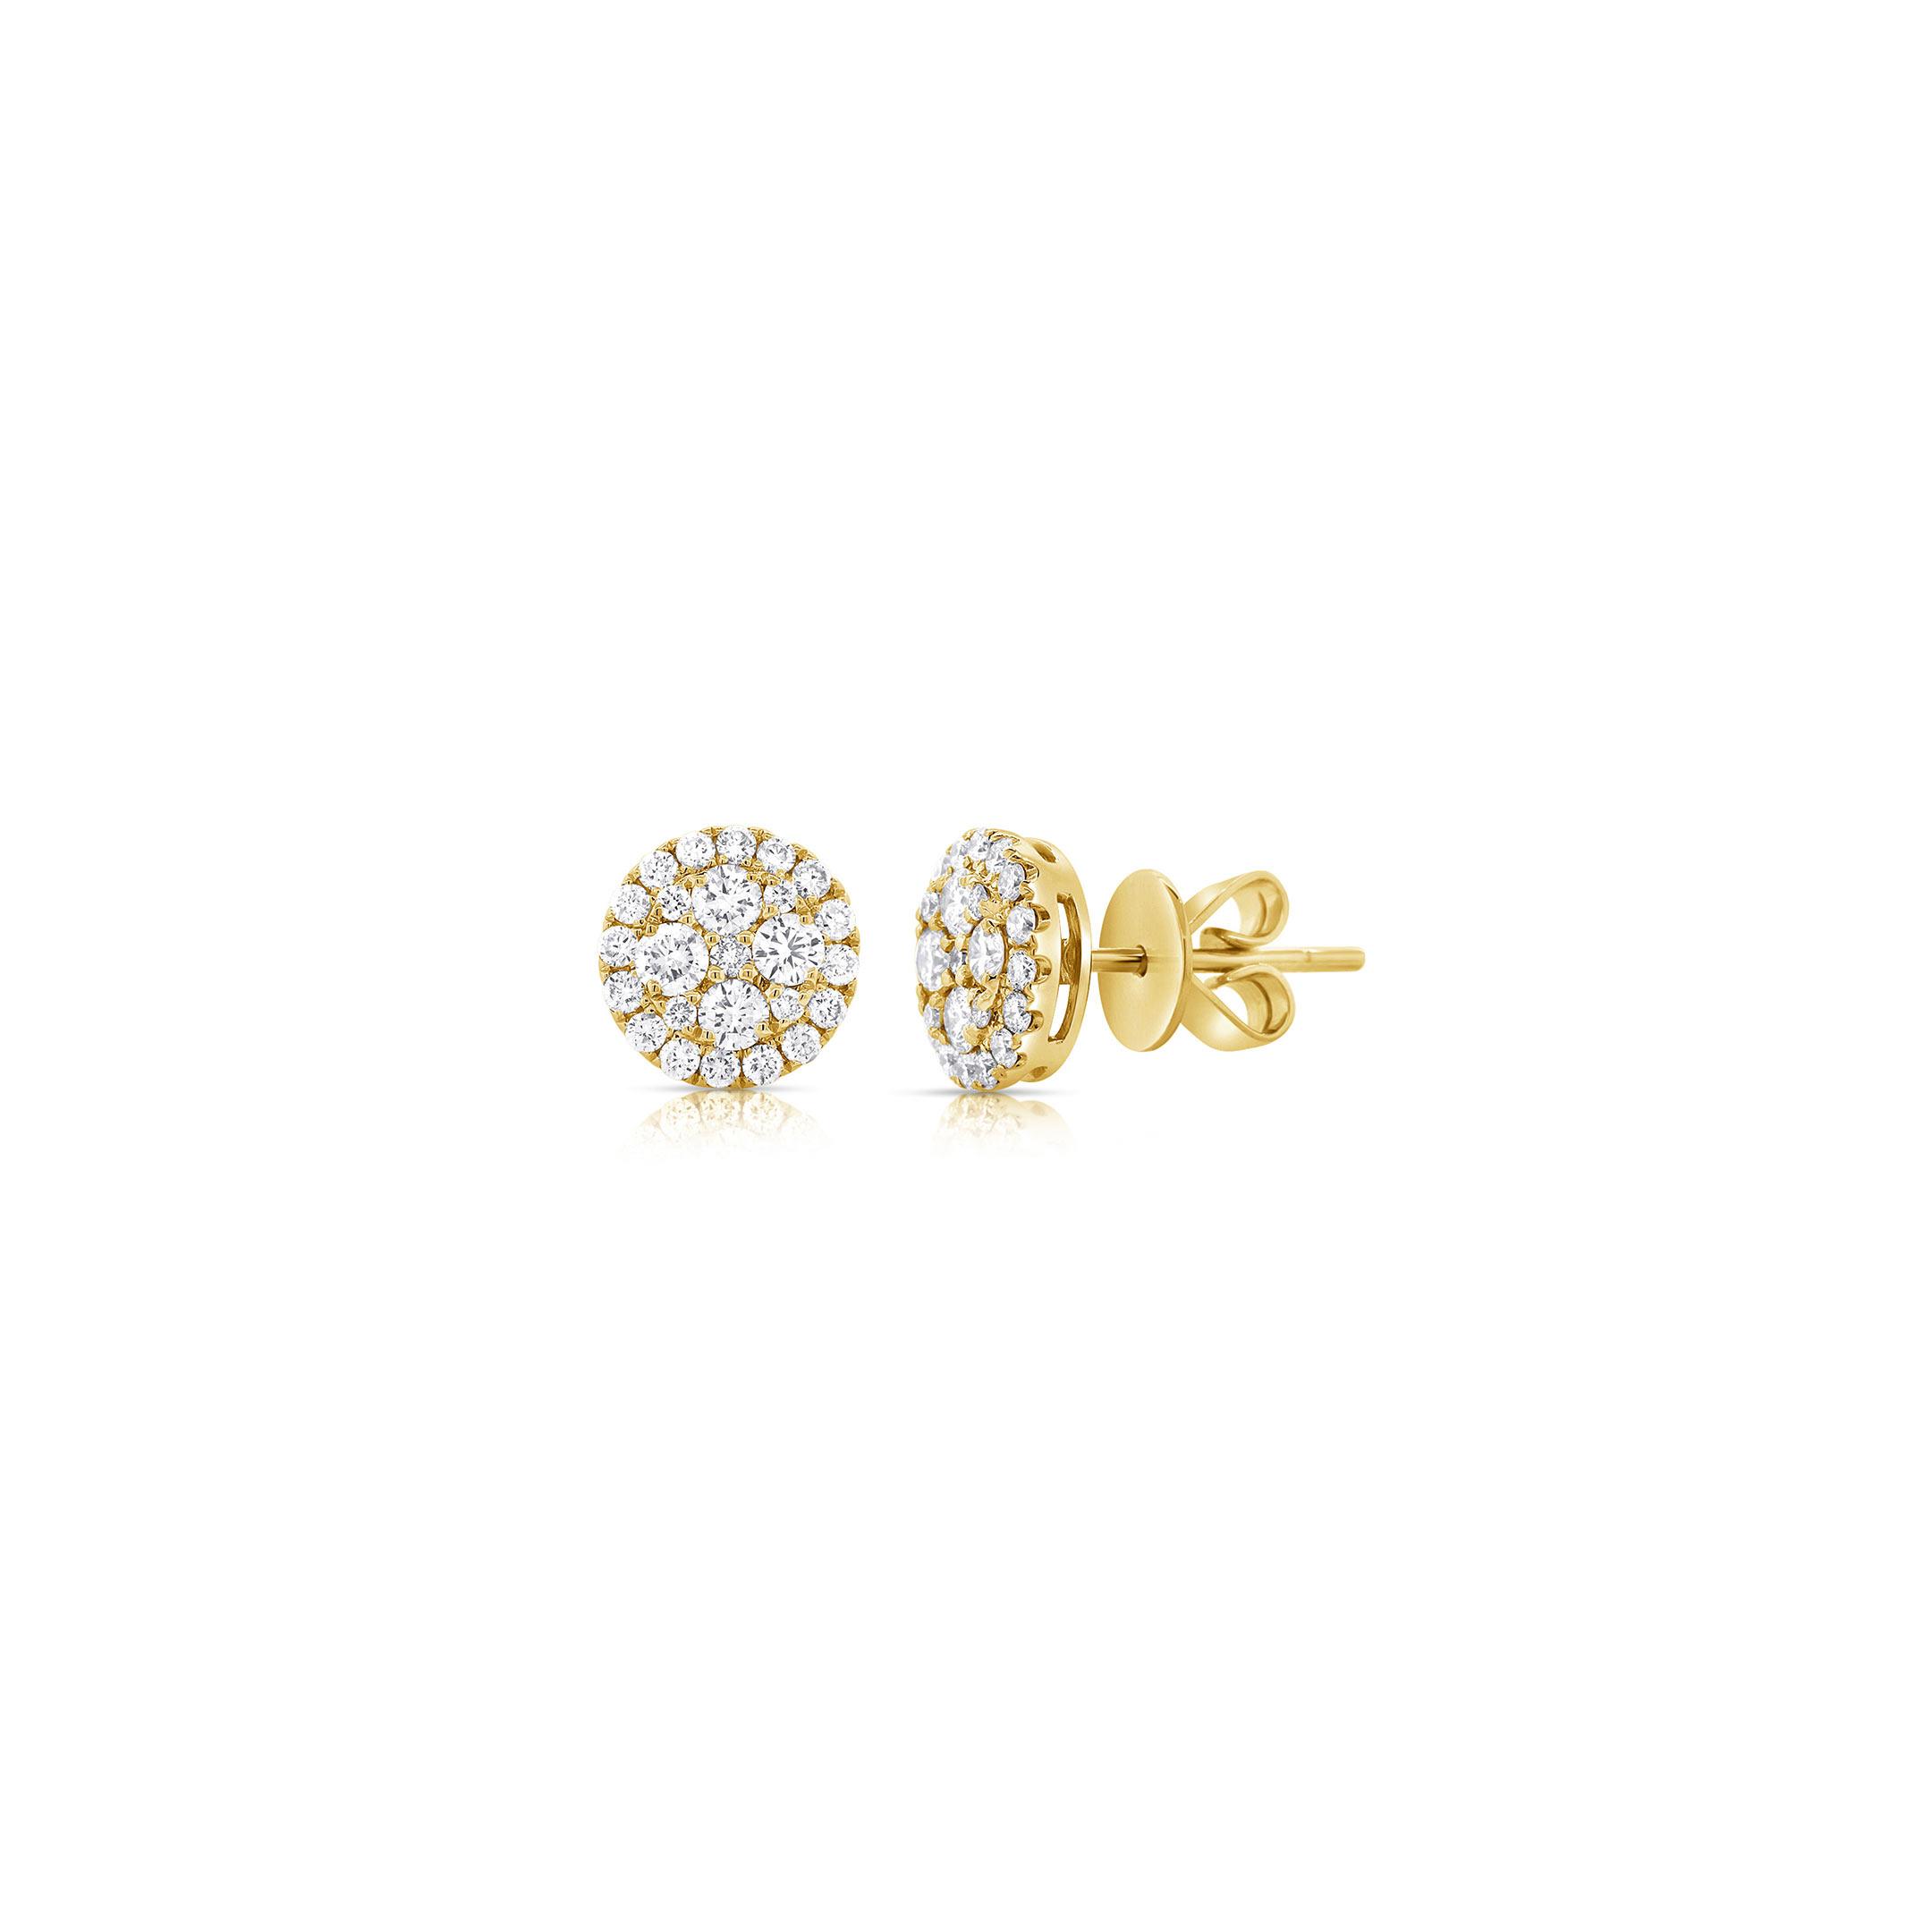 round-diamond-cluster-stud-earrings-14k-gold